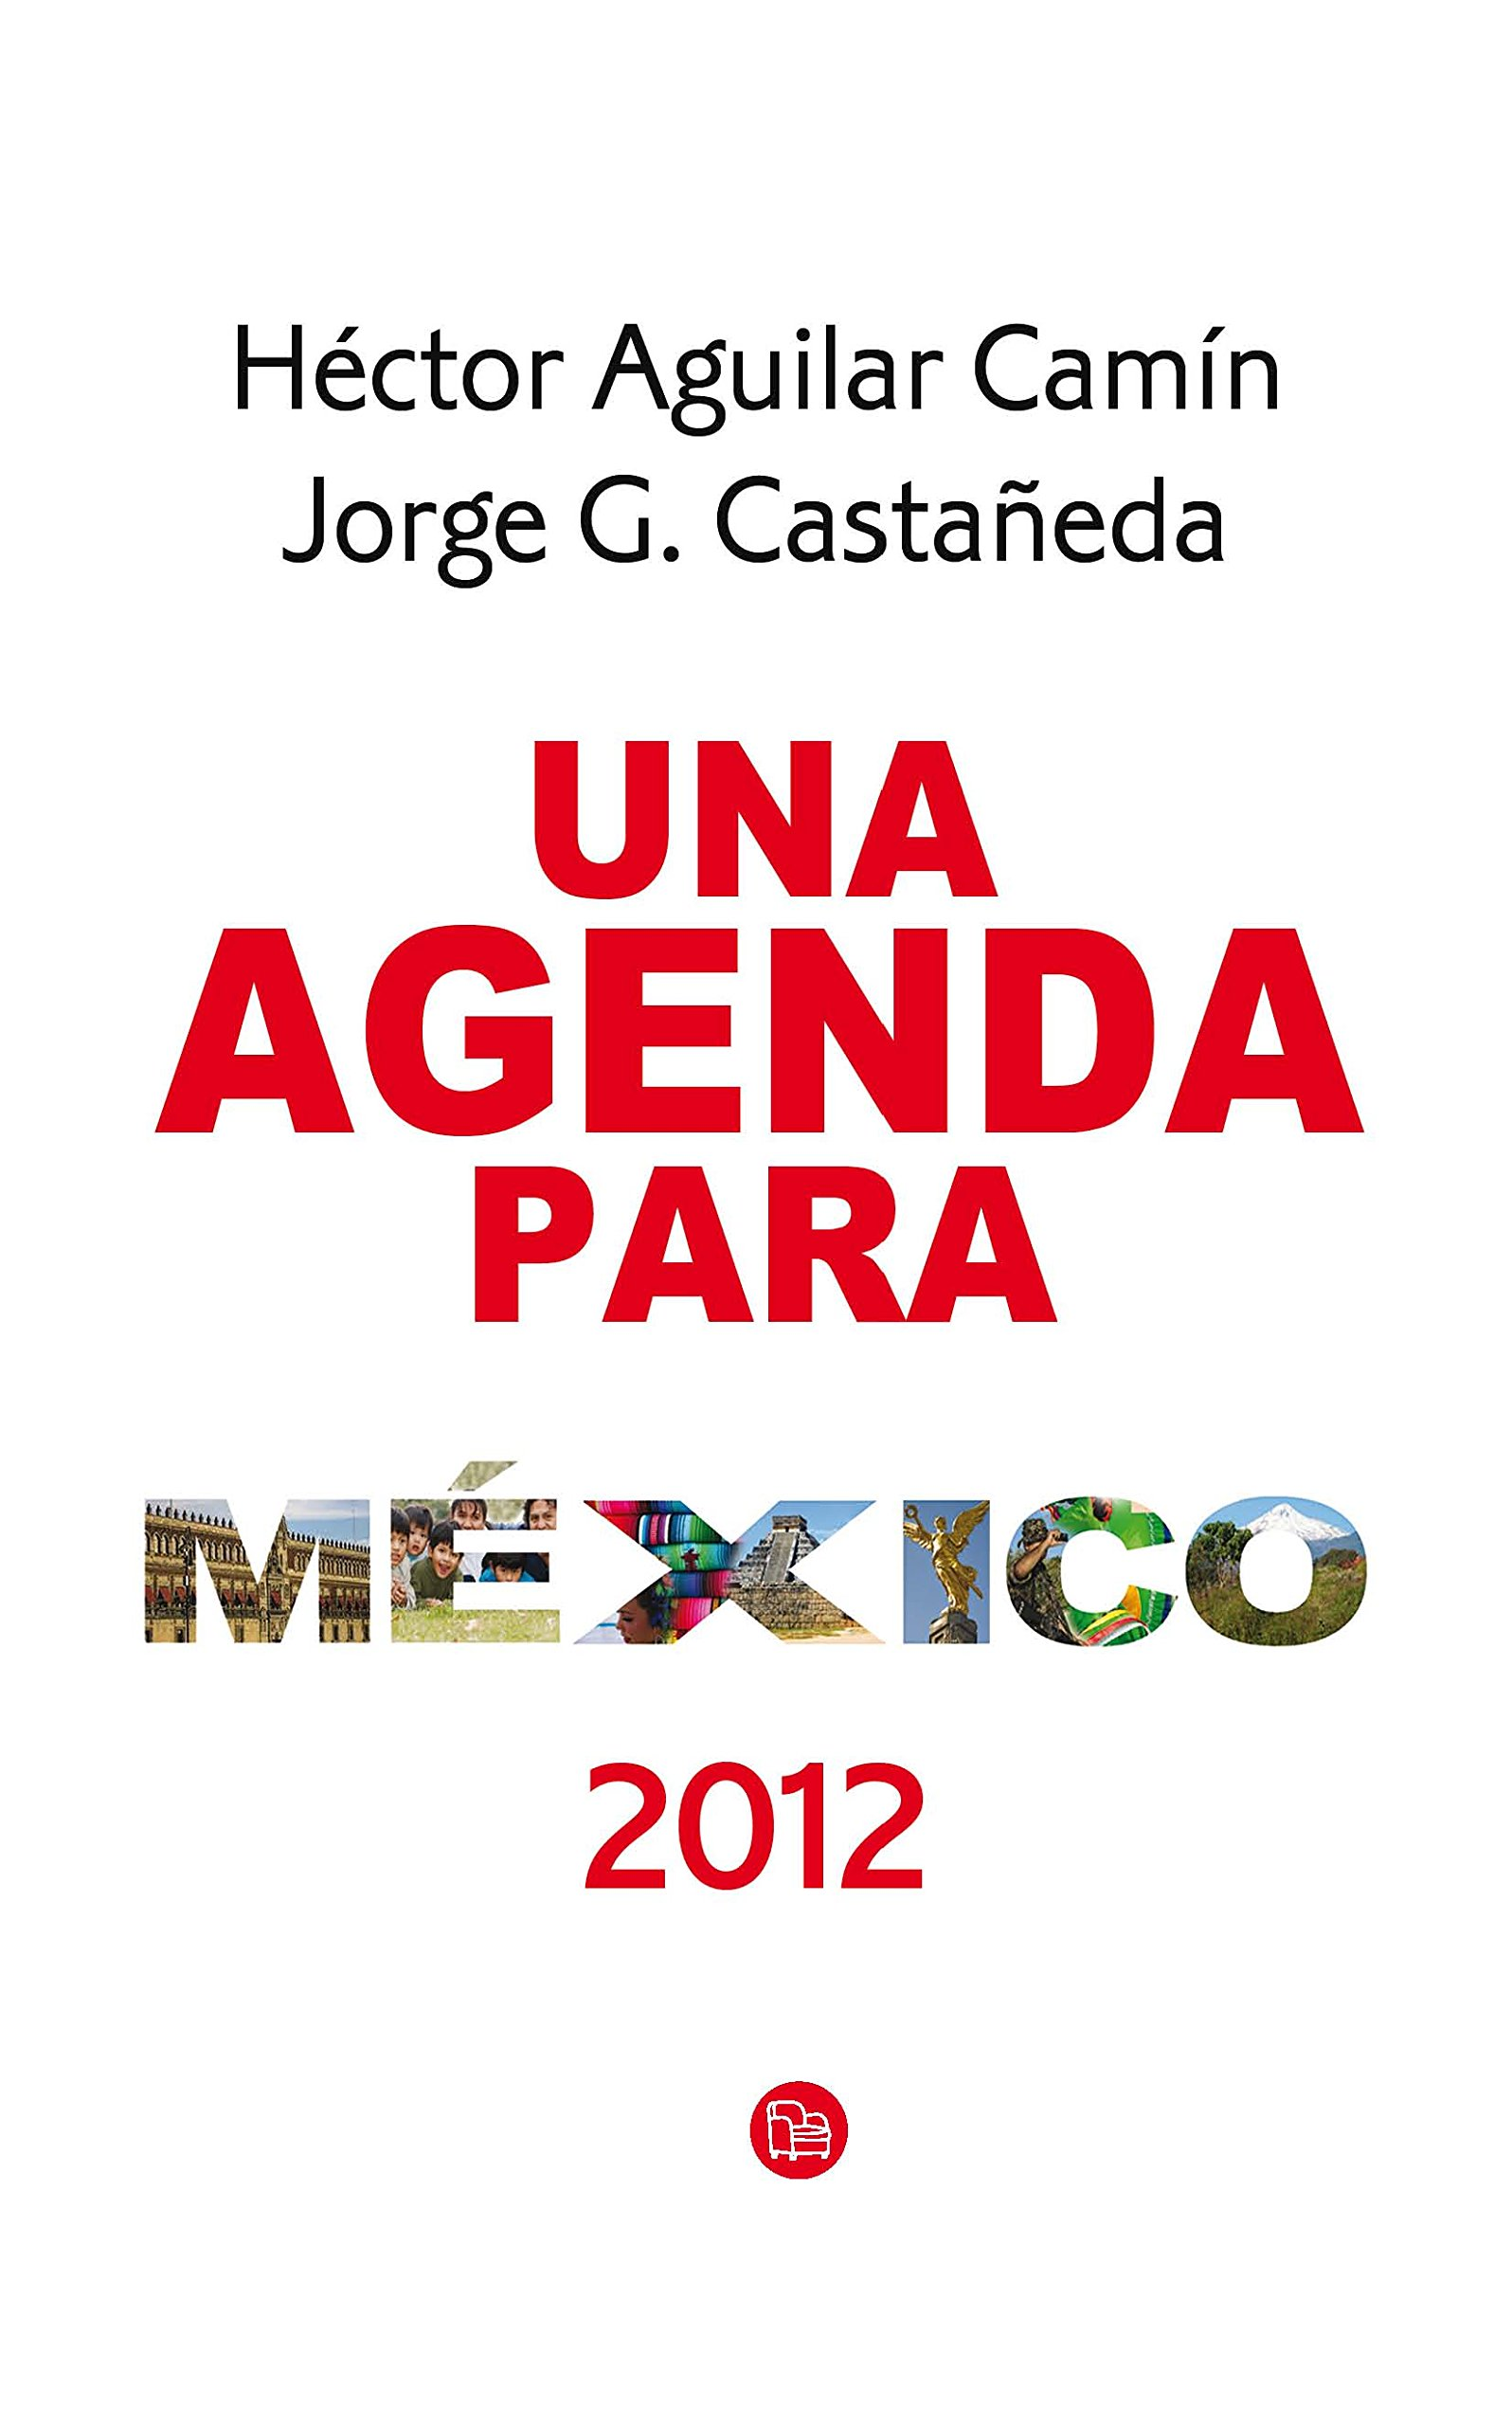 Agenda para Mexico (Spanish Edition): Hector Aguilar Camin ...